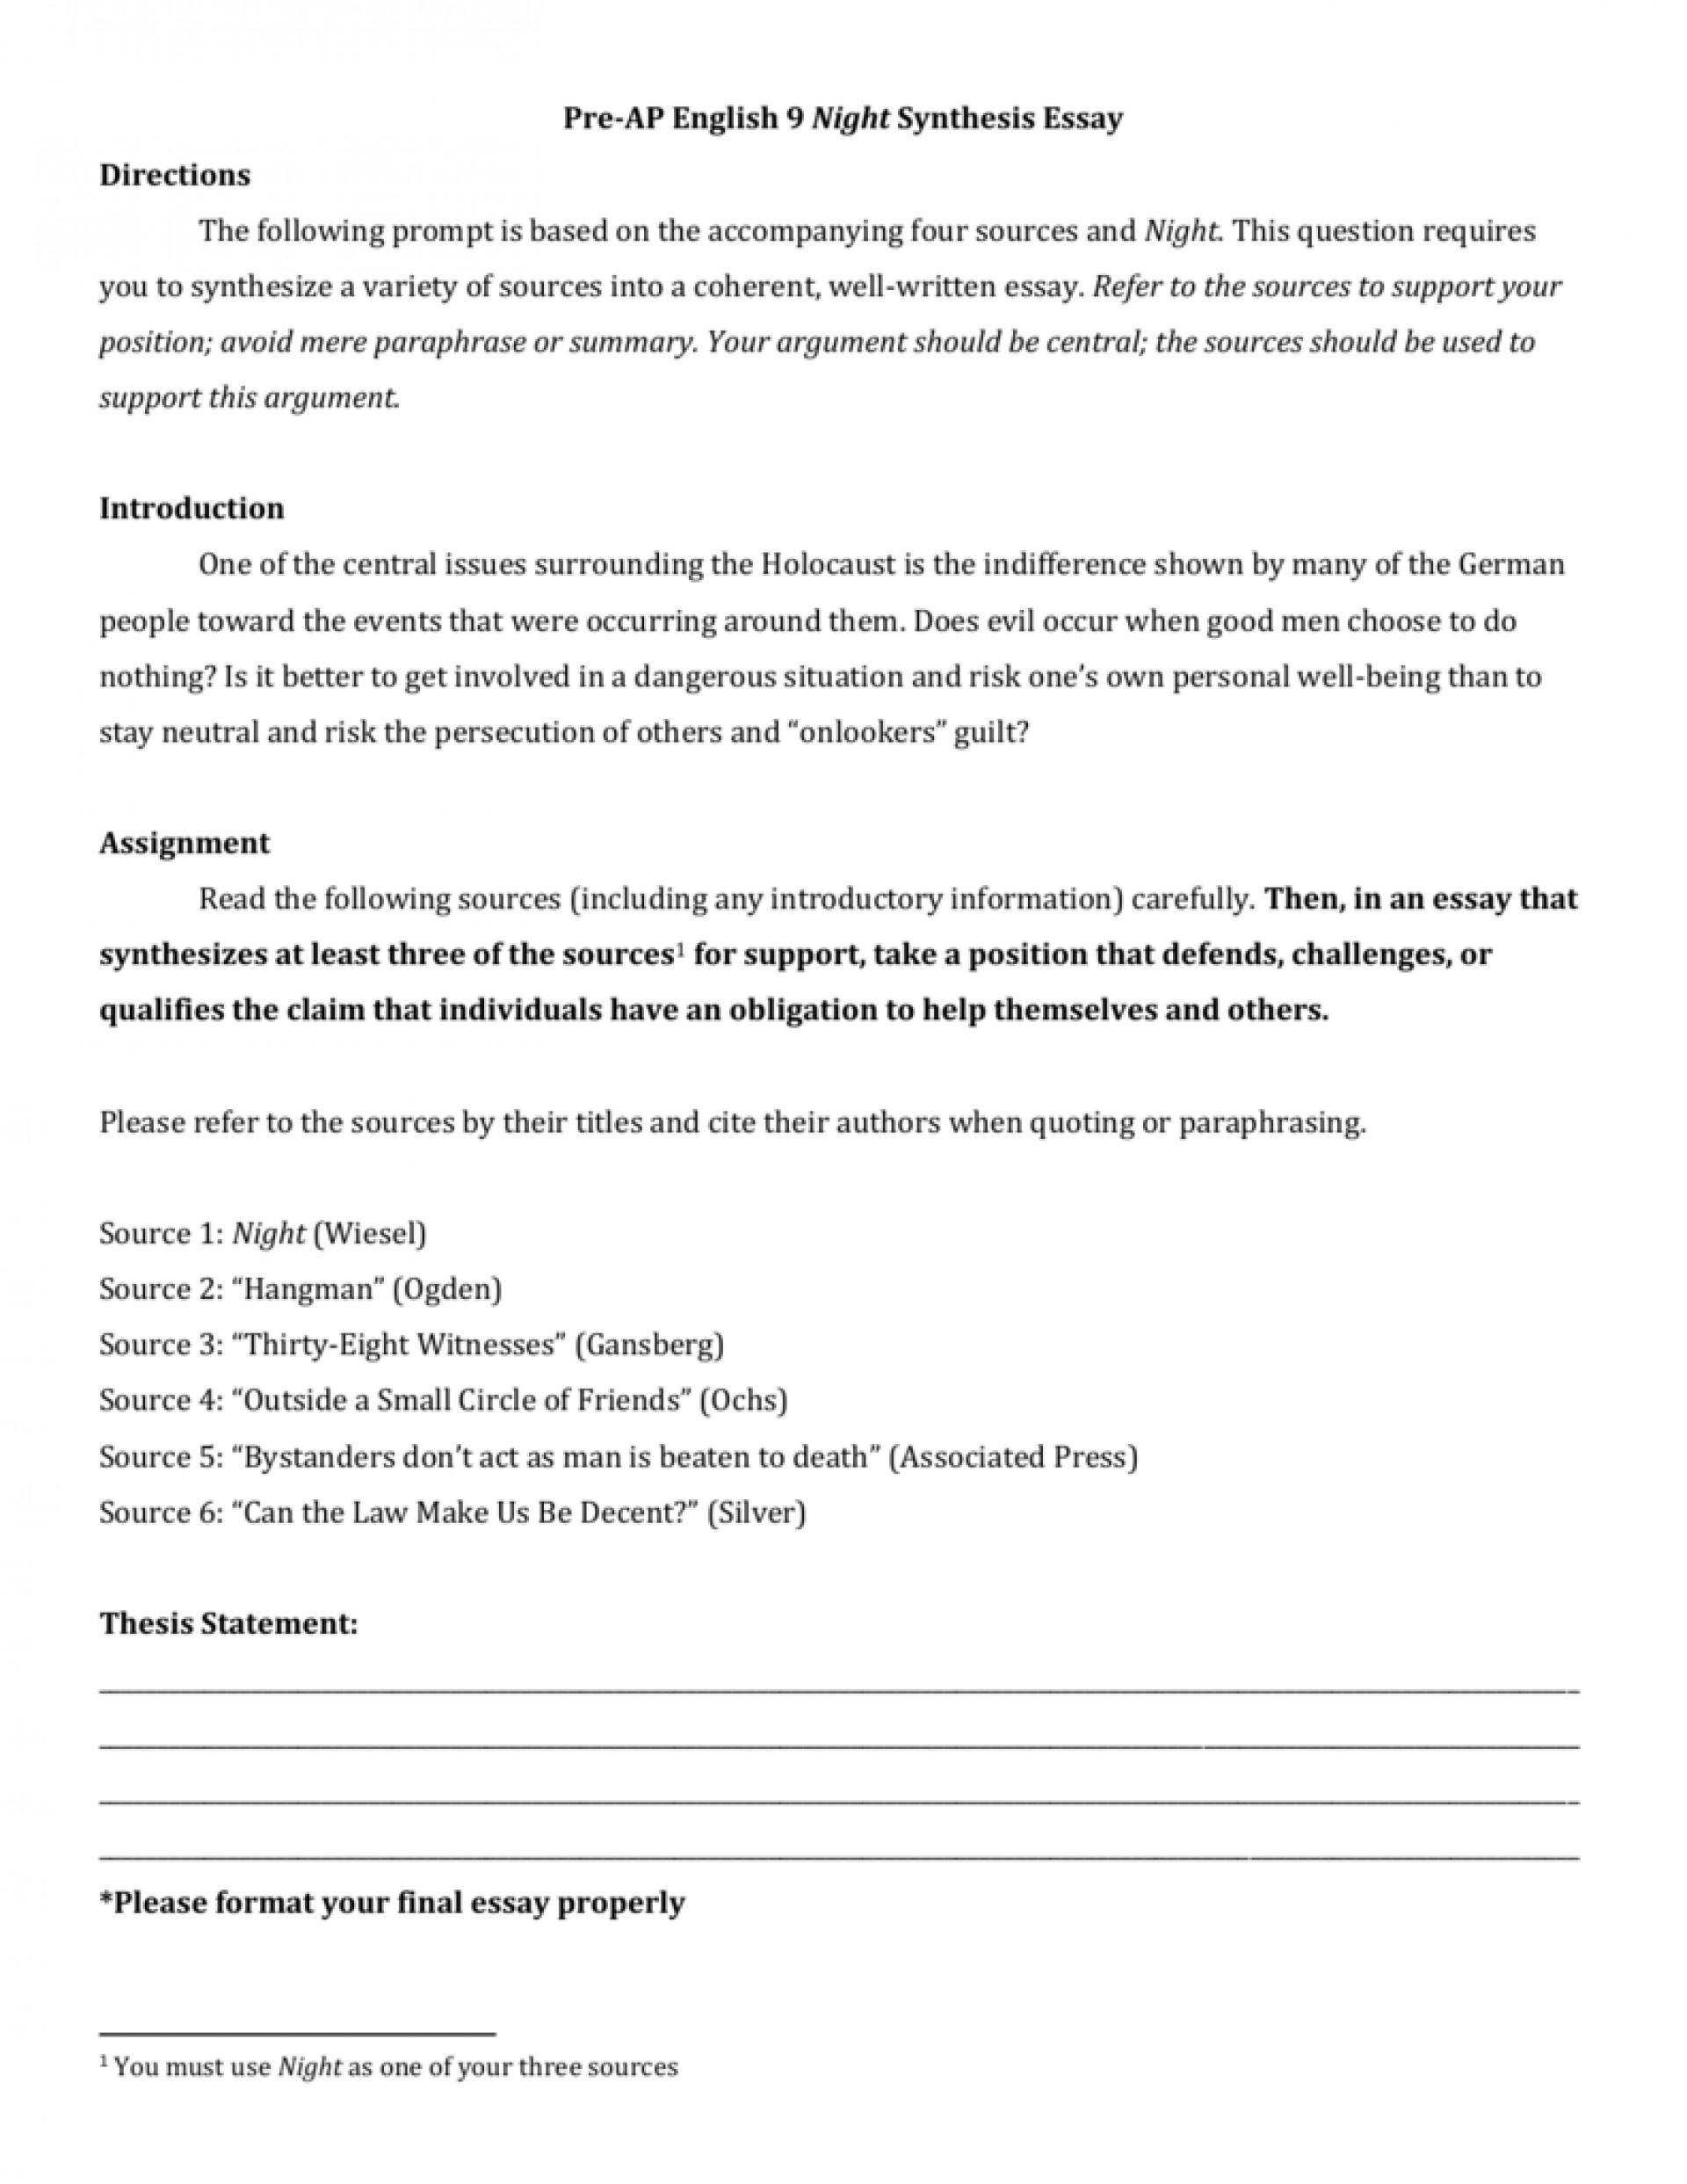 003 006963363 1 Synthesis Essay Sensational Prompt Outline Pdf 1920